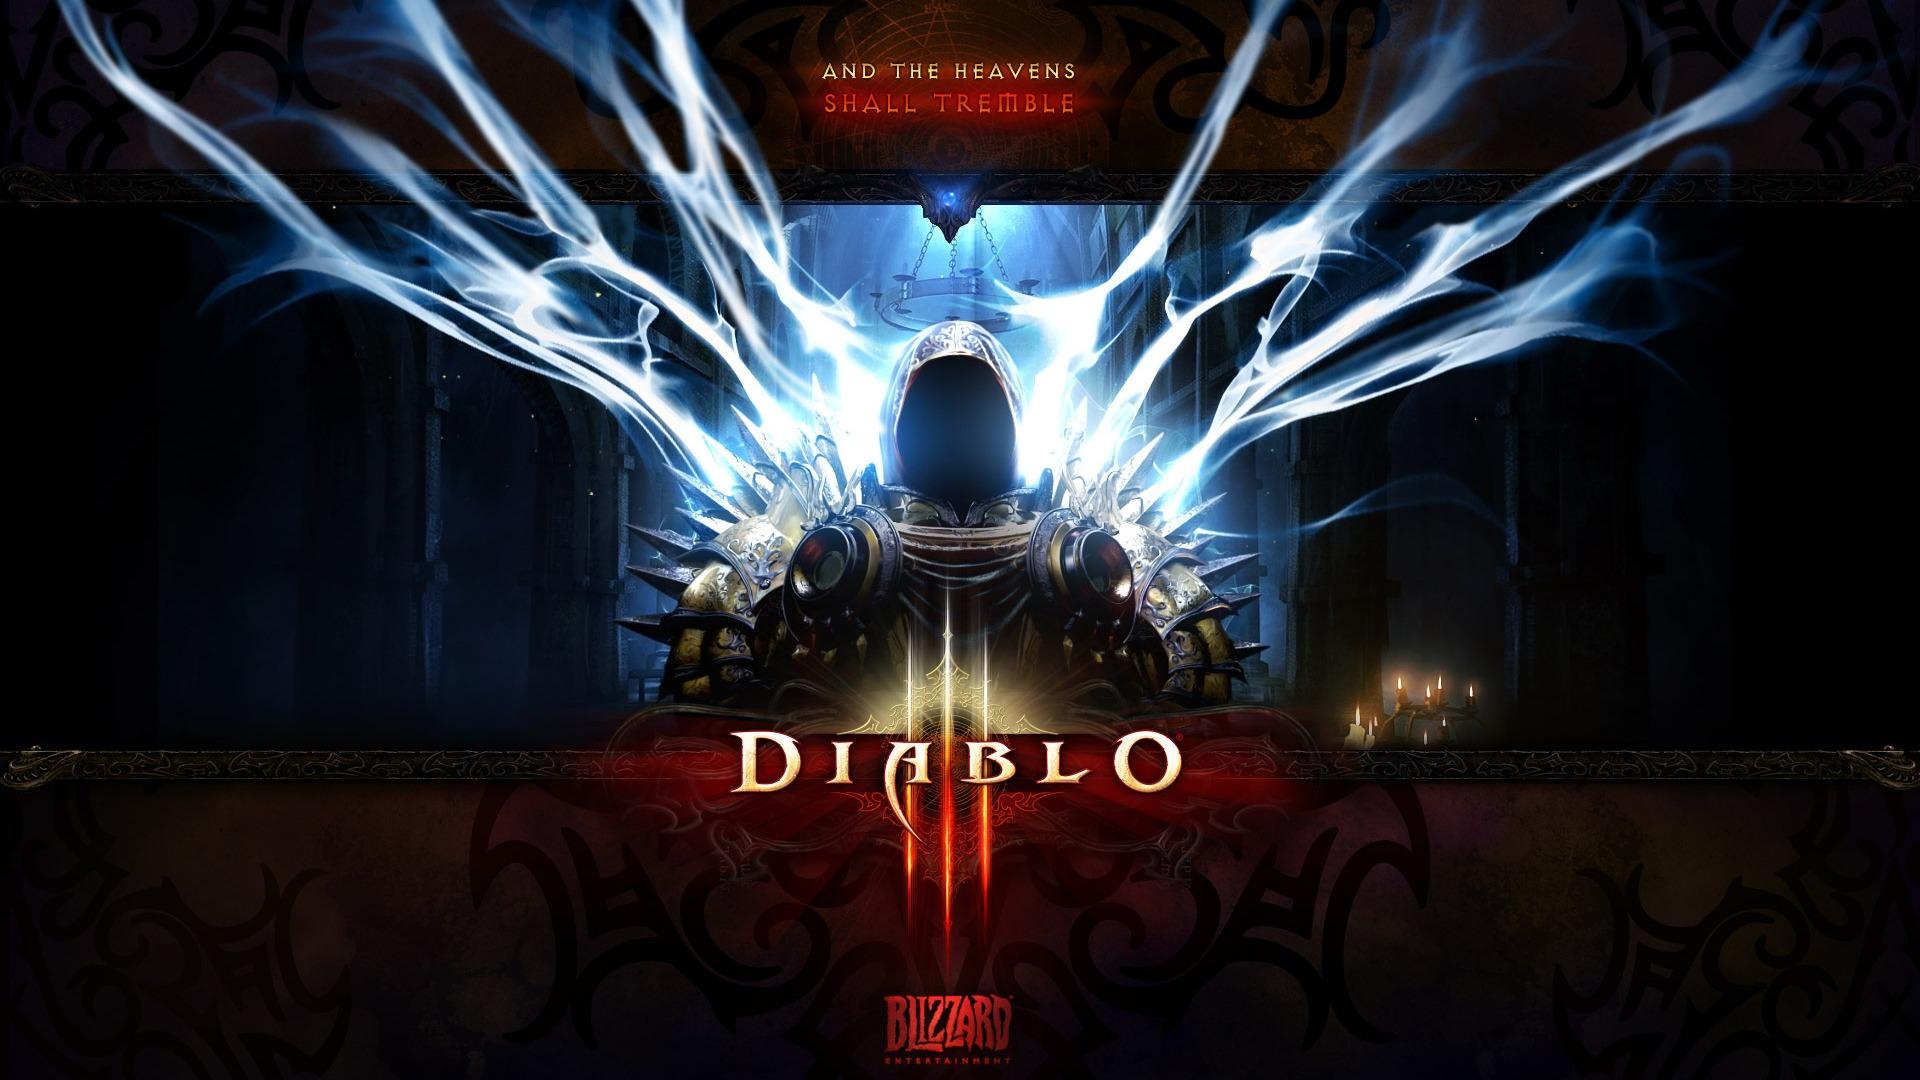 Video Game - Diablo III  Video Game Tyrael (Diablo III) Wallpaper